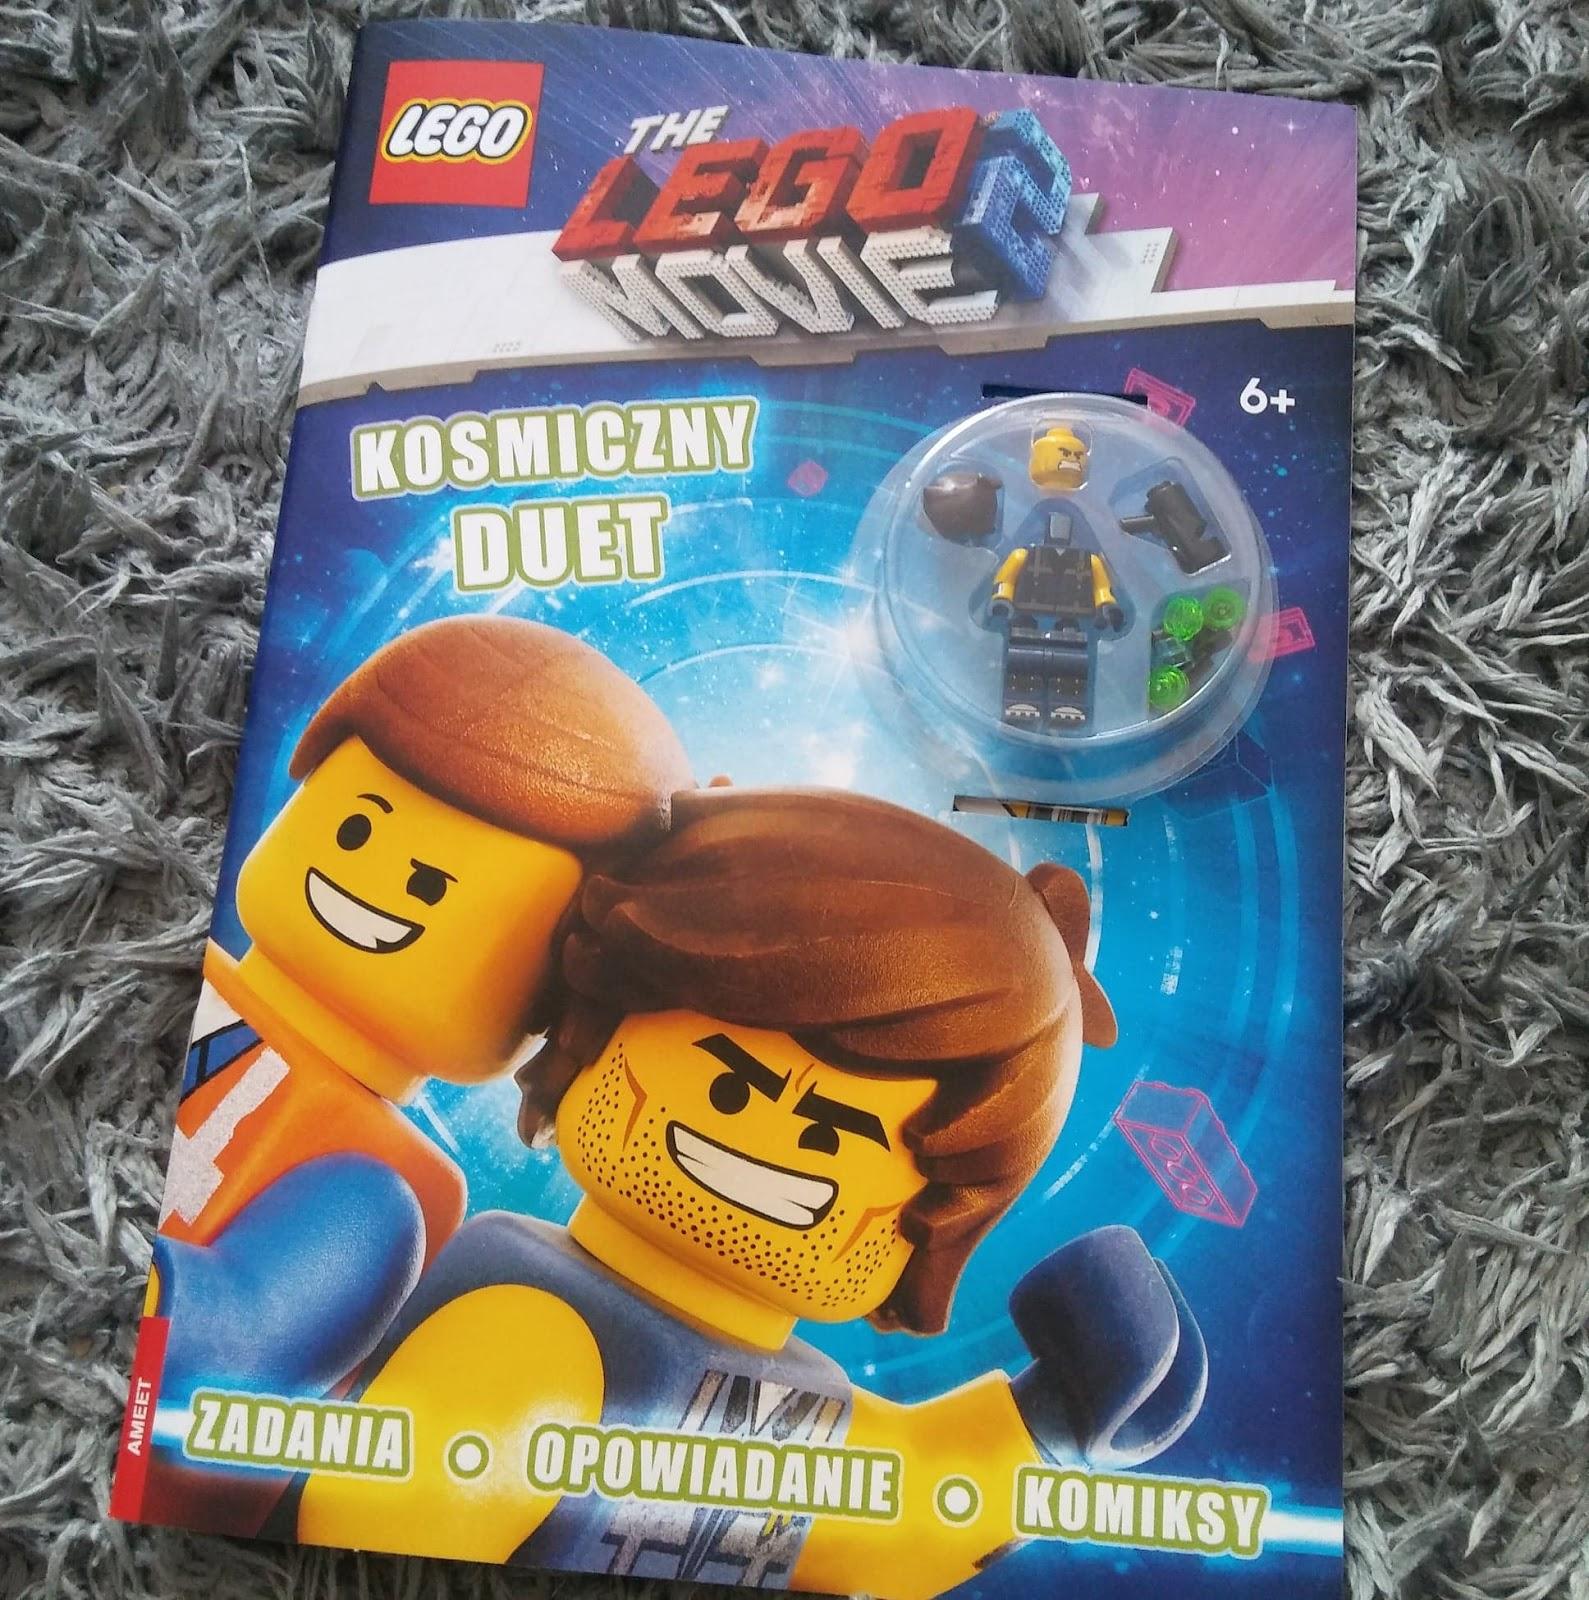 AMEET- THE LEGO MOVIE 2 Kosmiczny duet